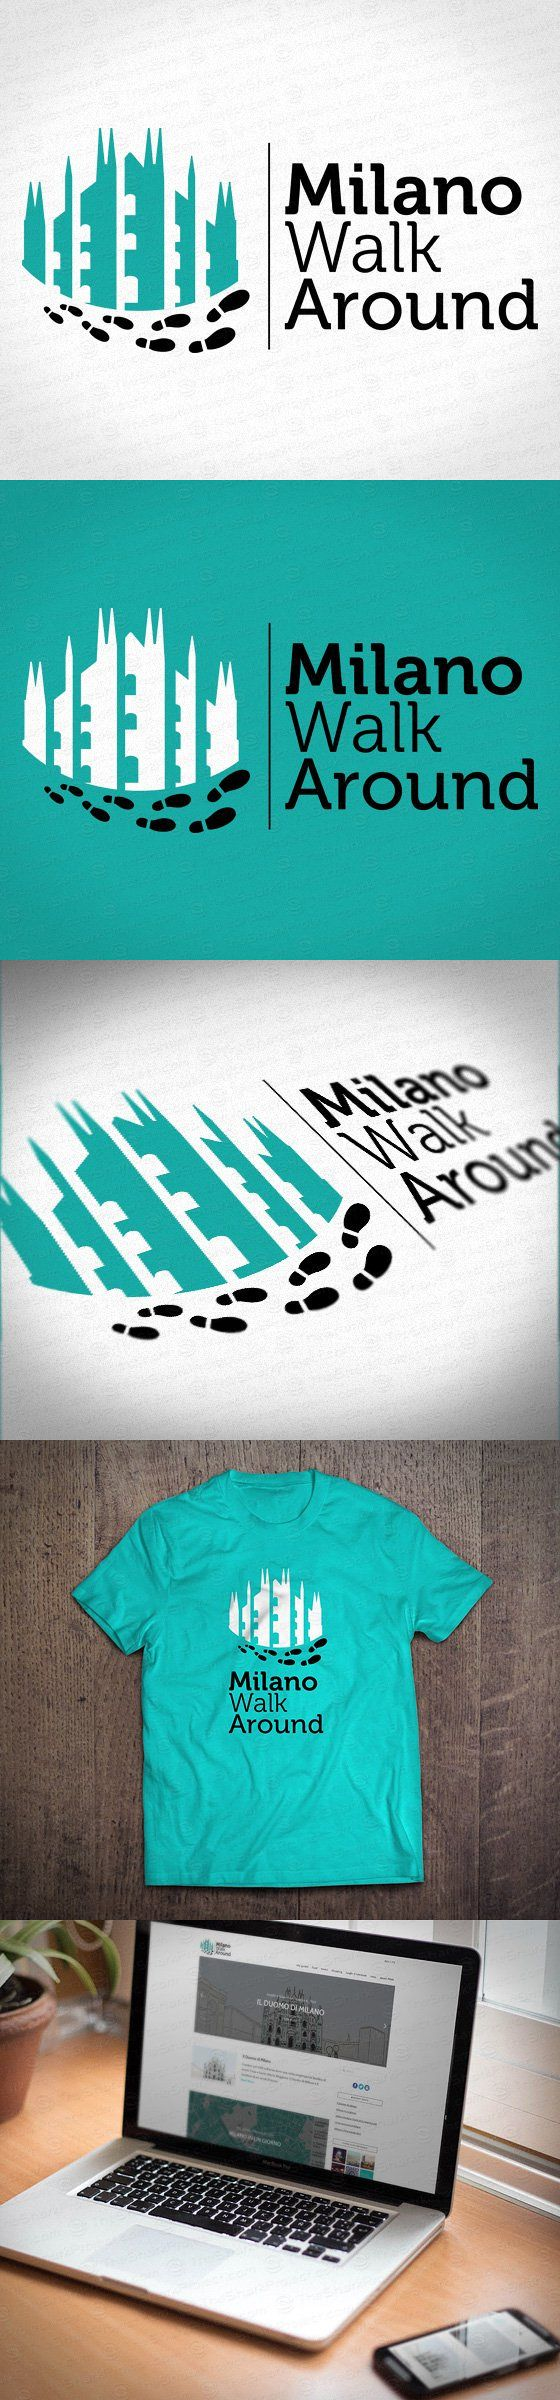 Milano Walk Around #logo by thesharkproject.com #corporateidentity #milano #mka #milan #expo2015 #travel #touring #walking